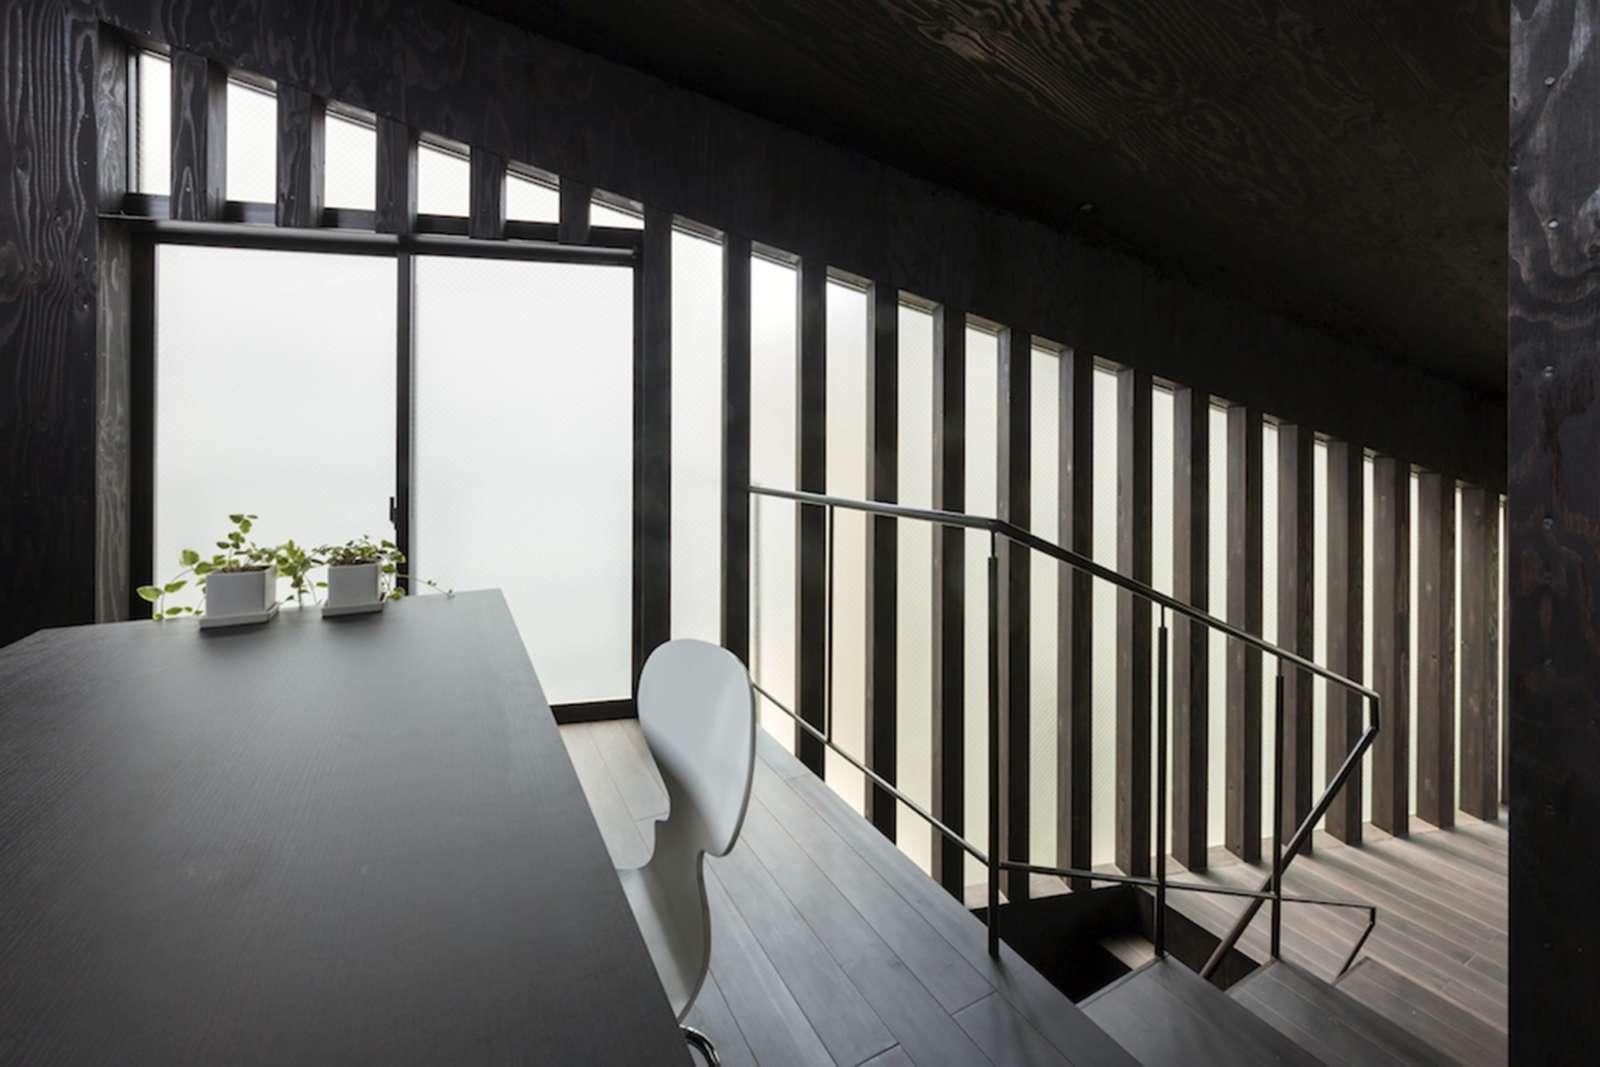 La maison par makiko tsukada yokohama dozodomo for Japanische architektur holz